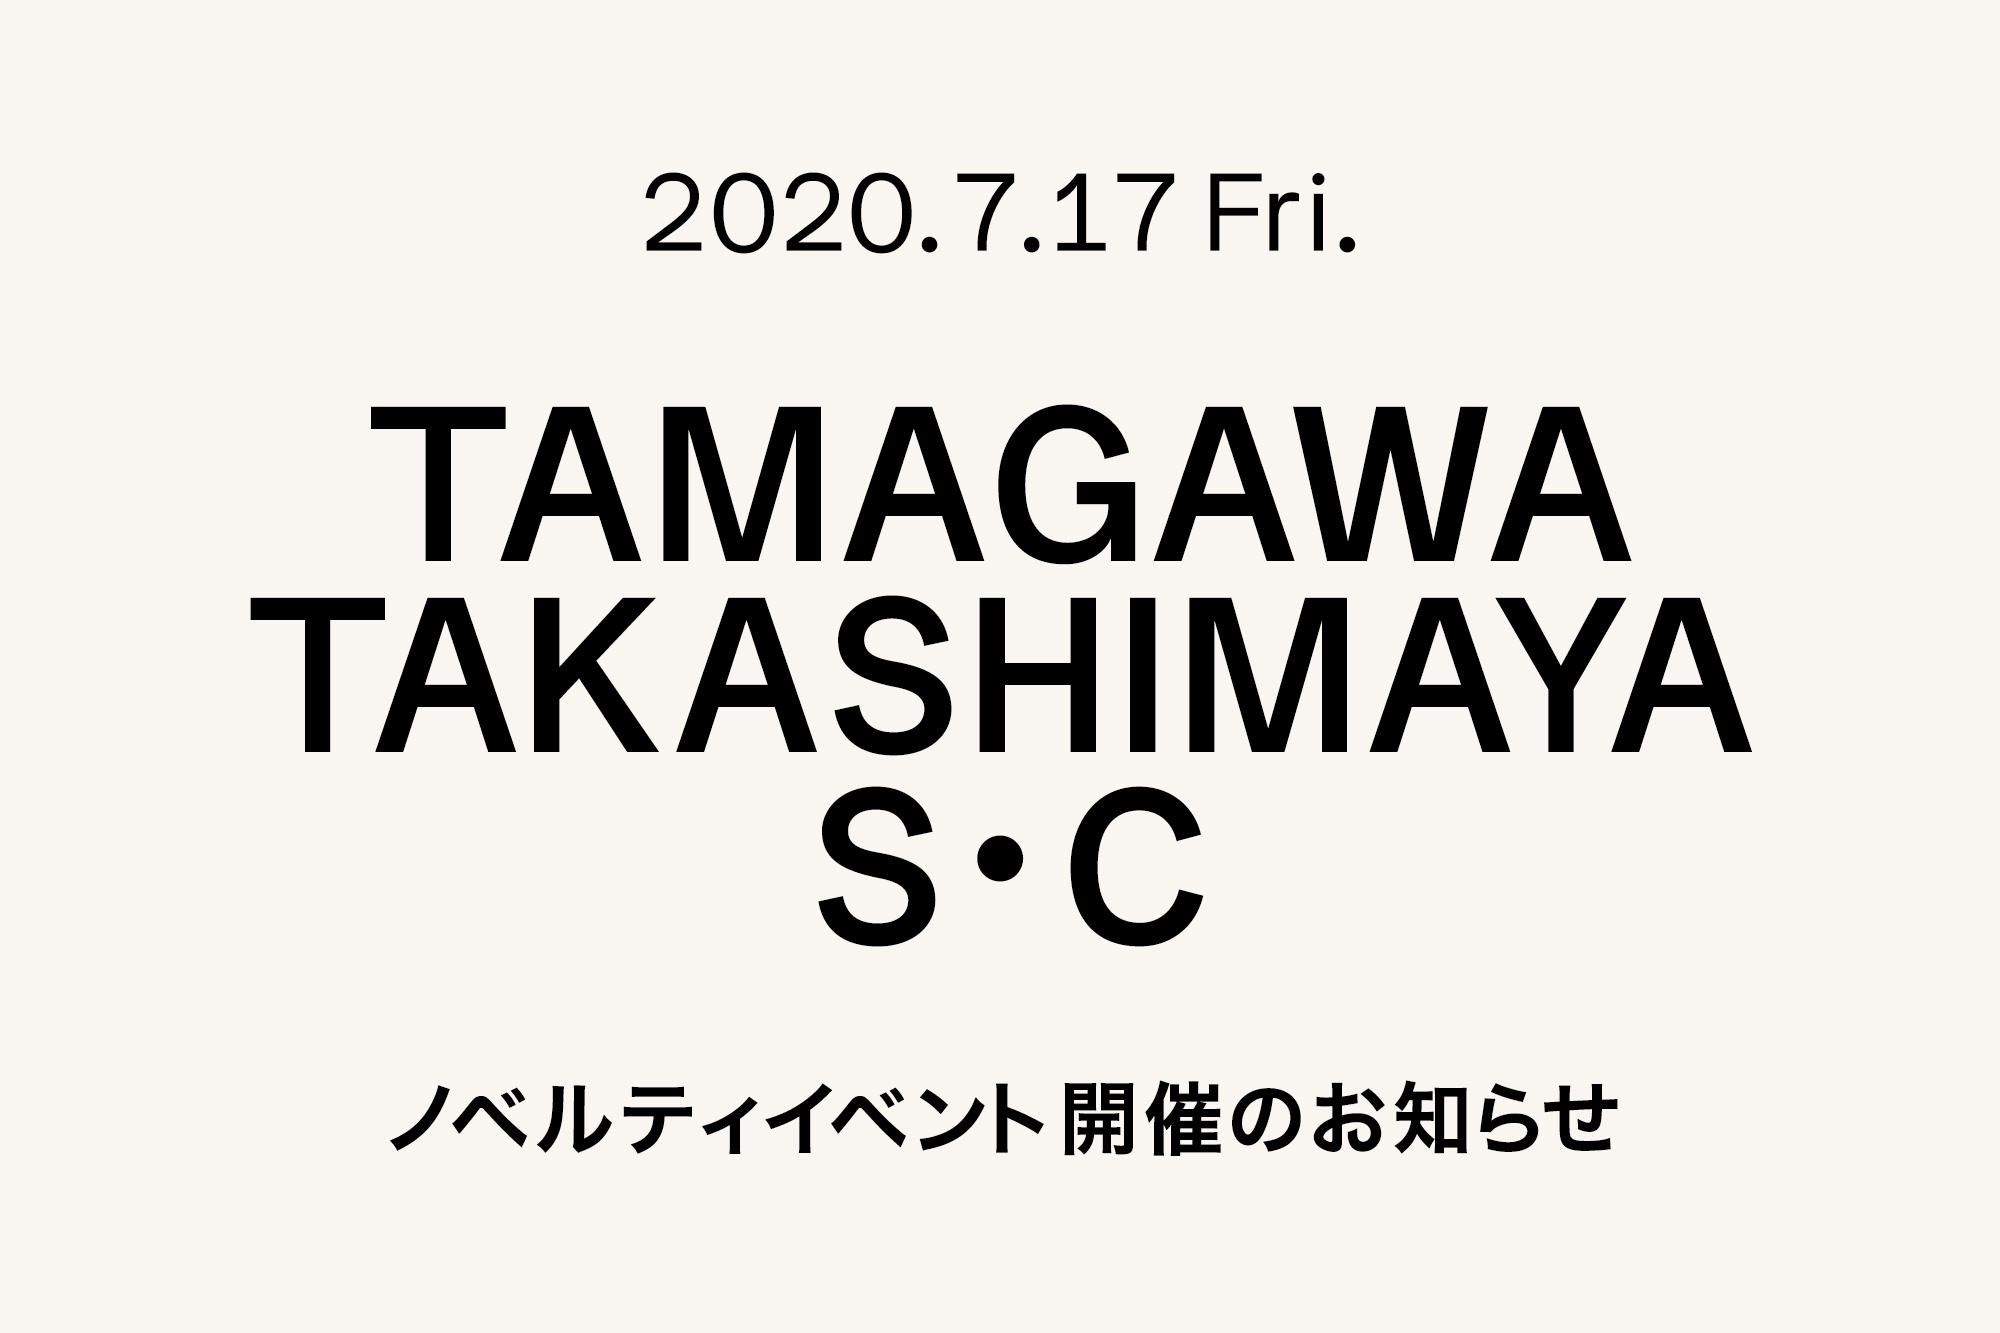 7.17- Marimekko 玉川高島屋S・C店 リニューアル記念  ノベルティイベント開催のお知らせ